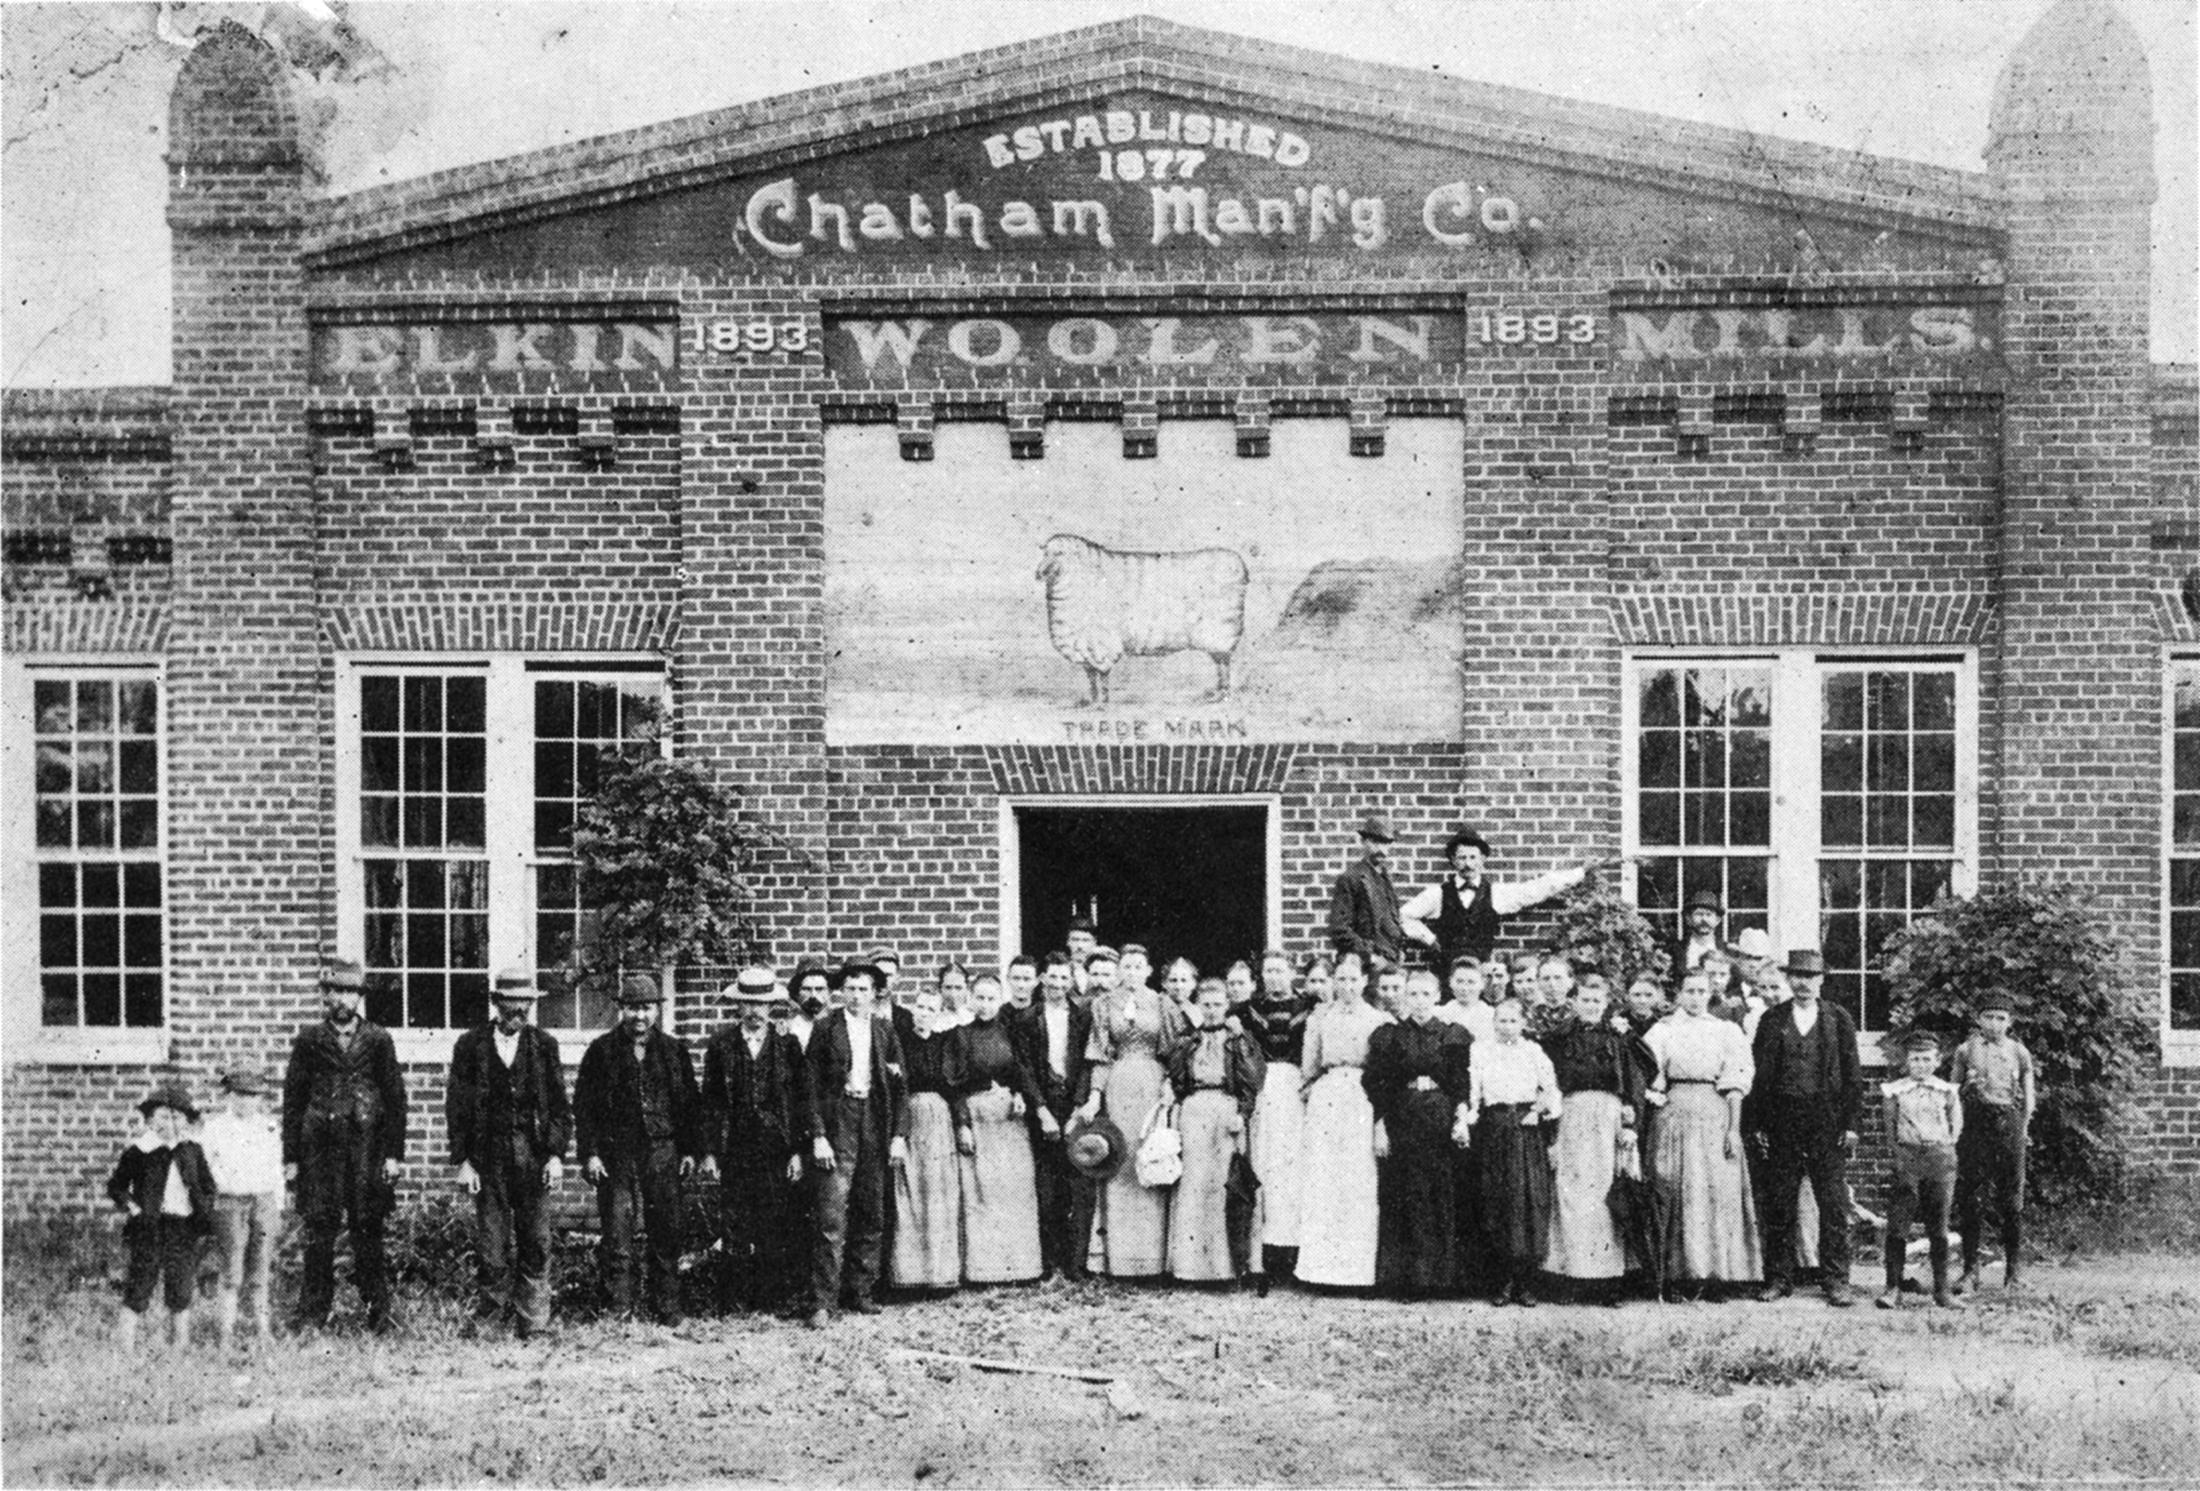 Chatham mill